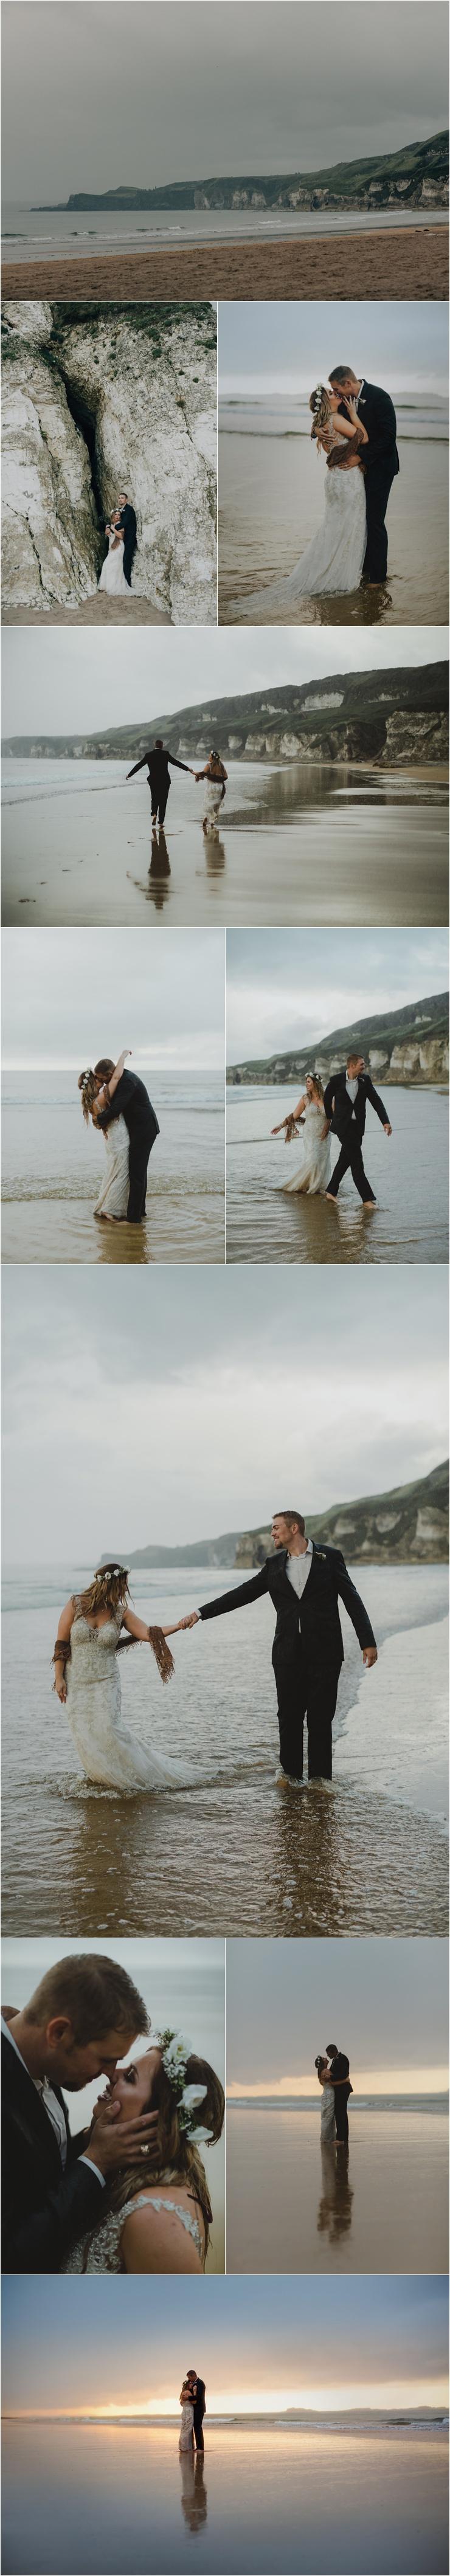 Kristina & Jeffrey elope on a beach in Northern Ireland by Paula O'Hara